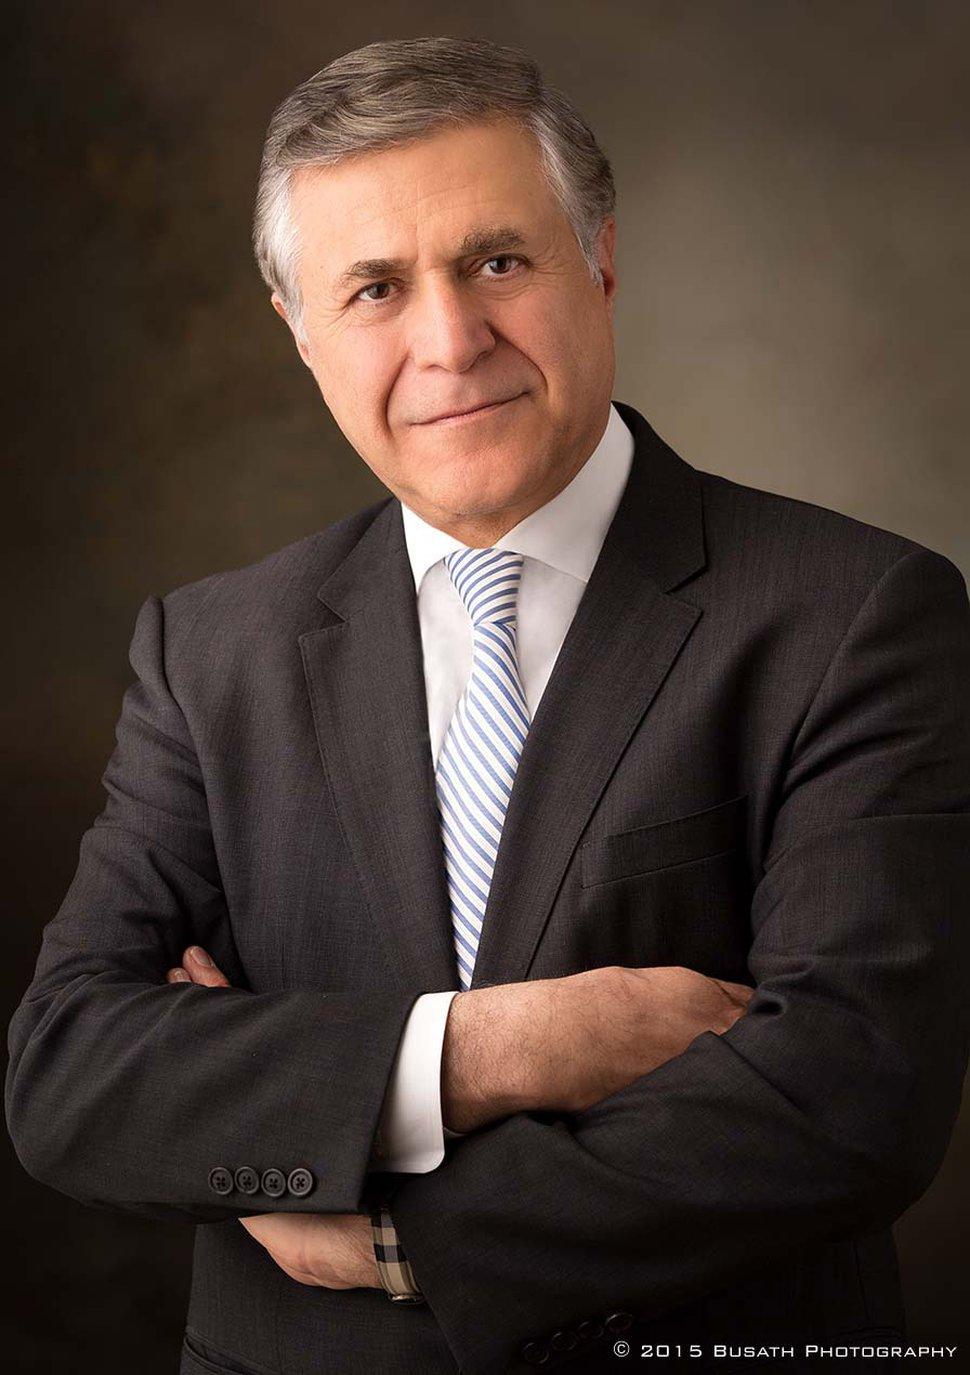 Khosrow Semnani